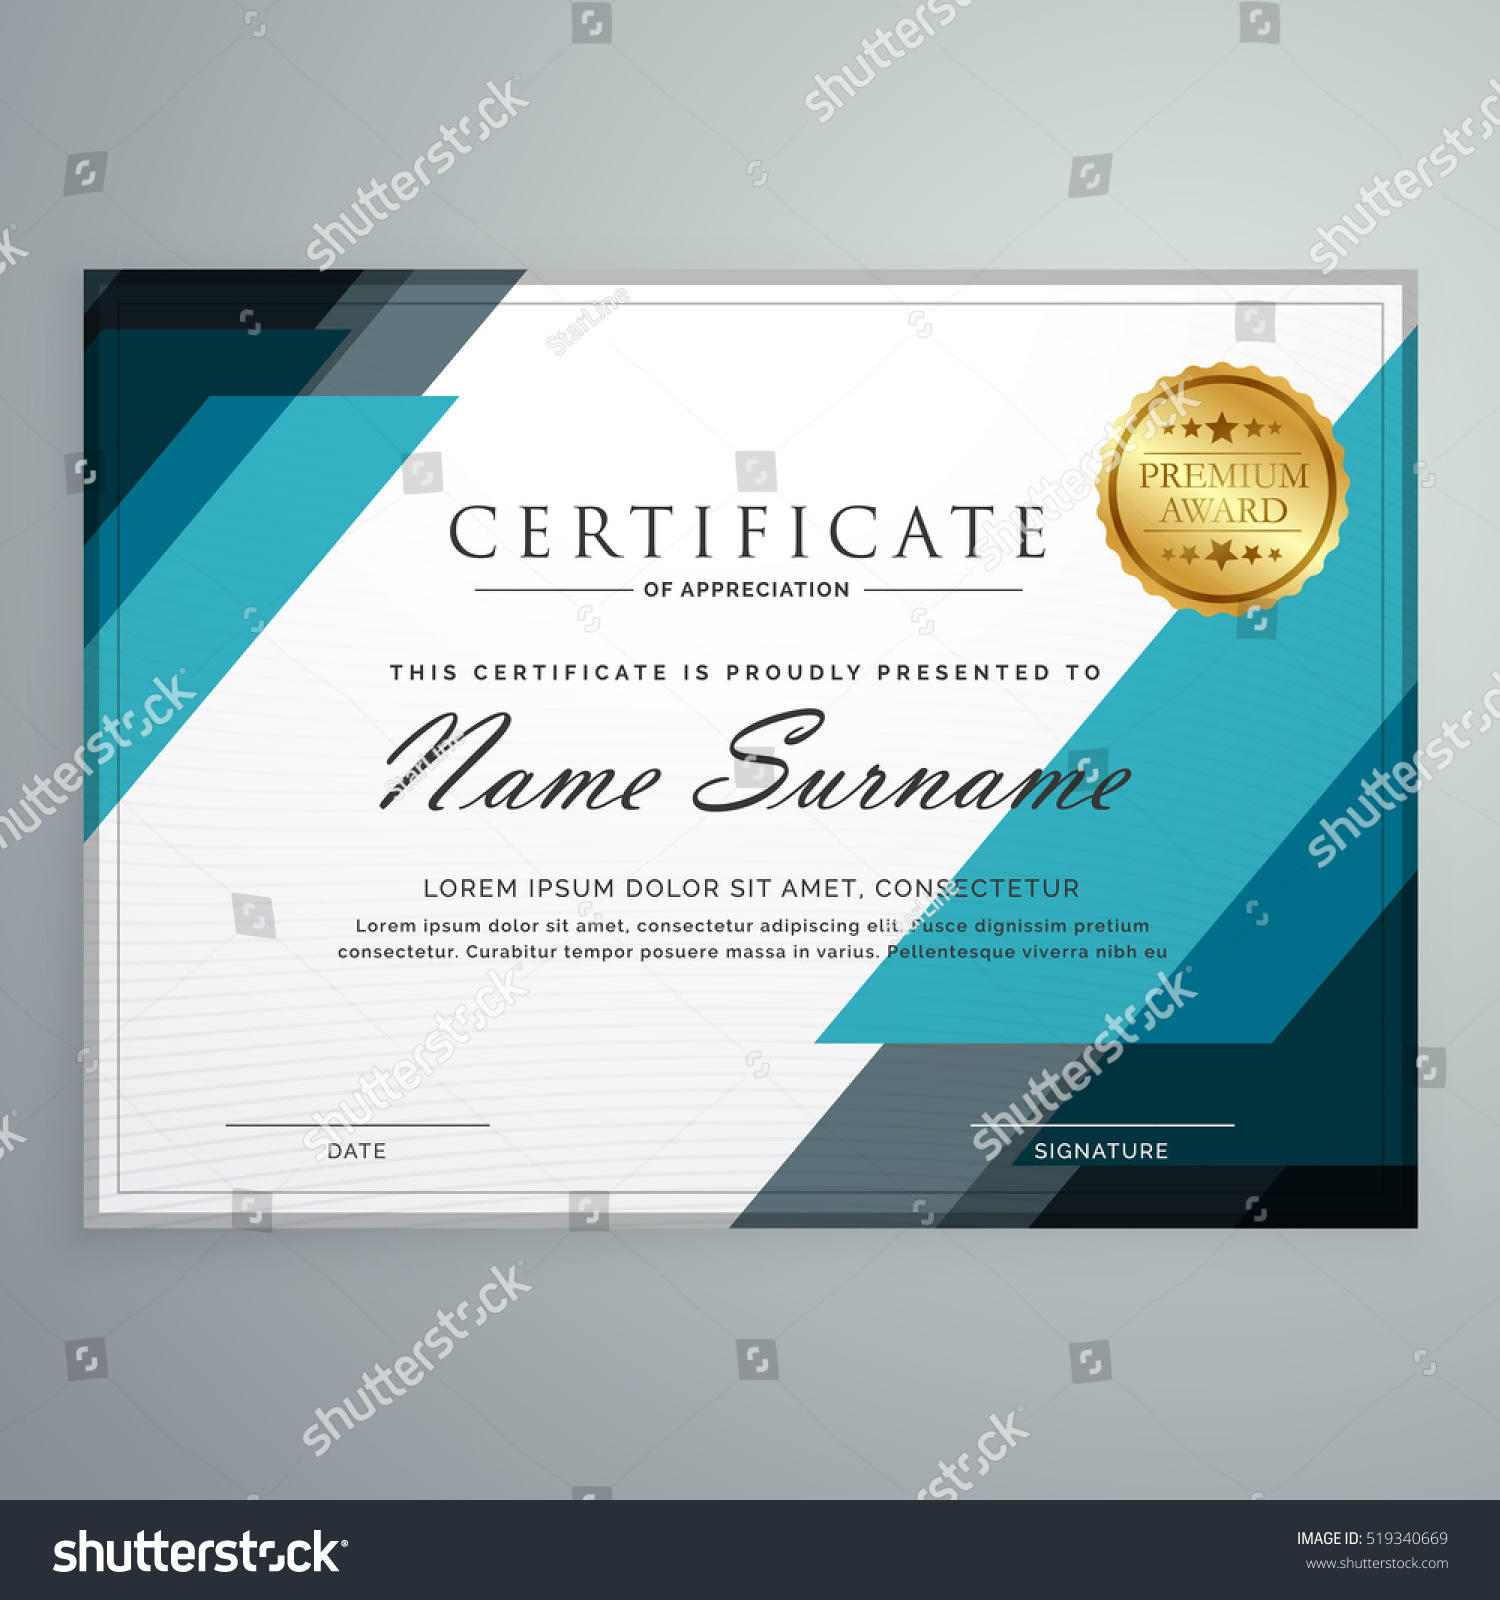 stylish certificate appreciation award design template のベクター